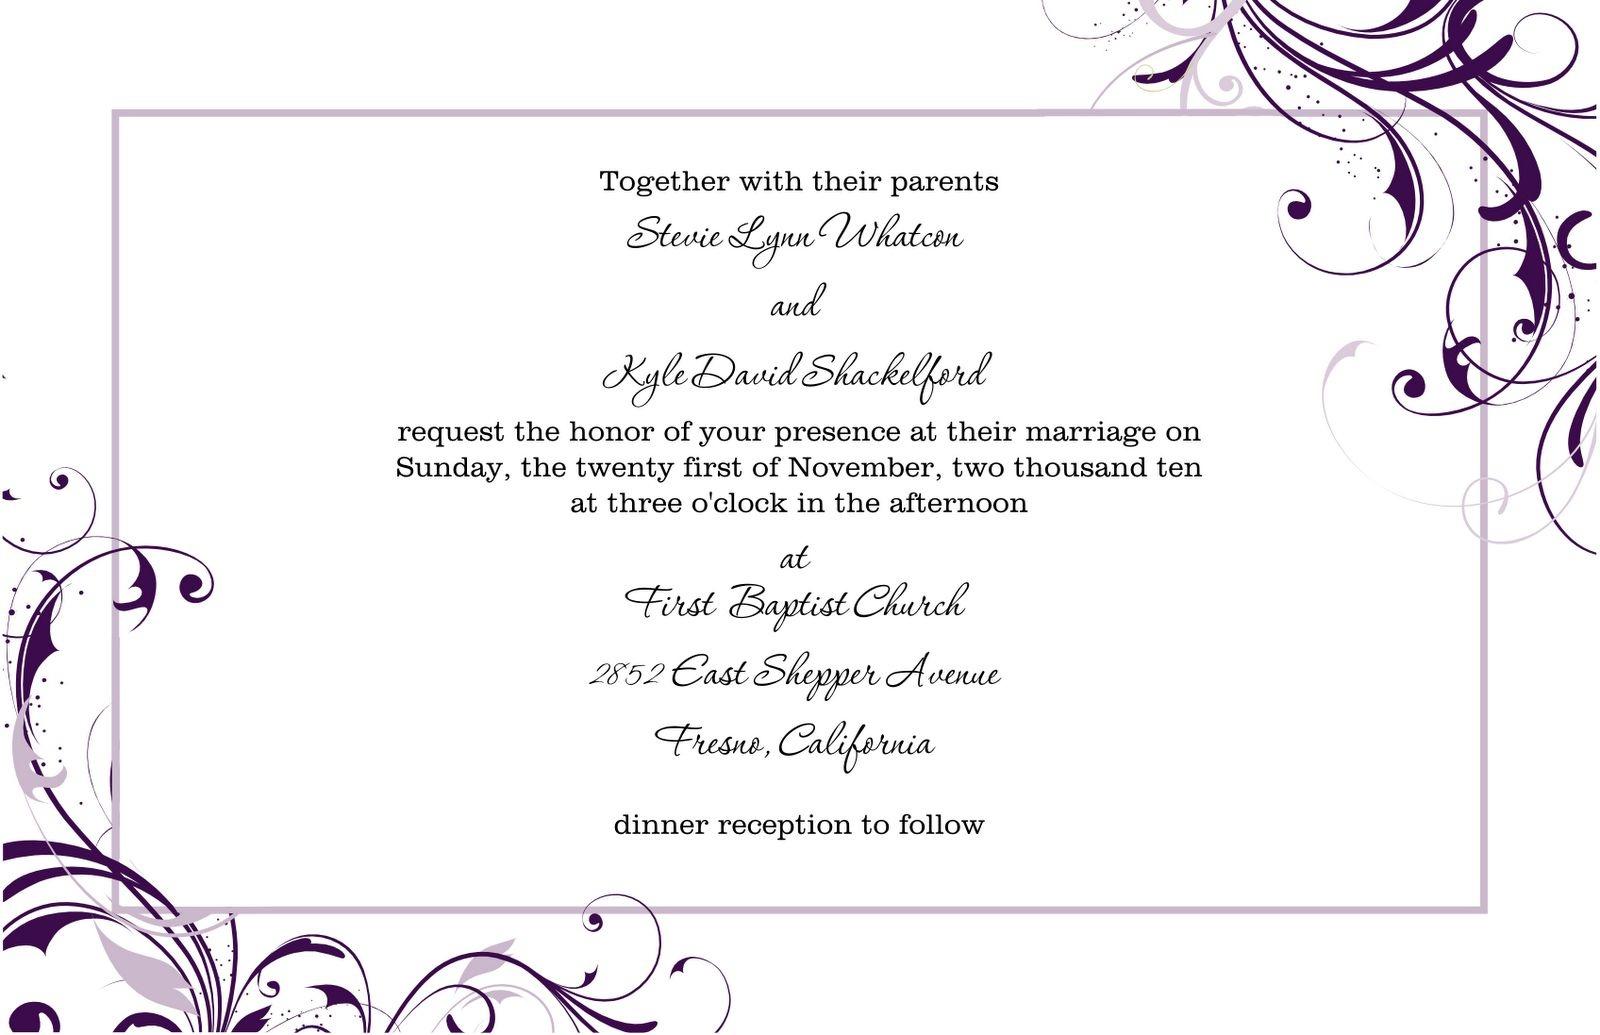 Free Wedding Invitation Templates For Word   Marina Gallery Fine Art - Free Printable Wedding Invitation Templates For Word